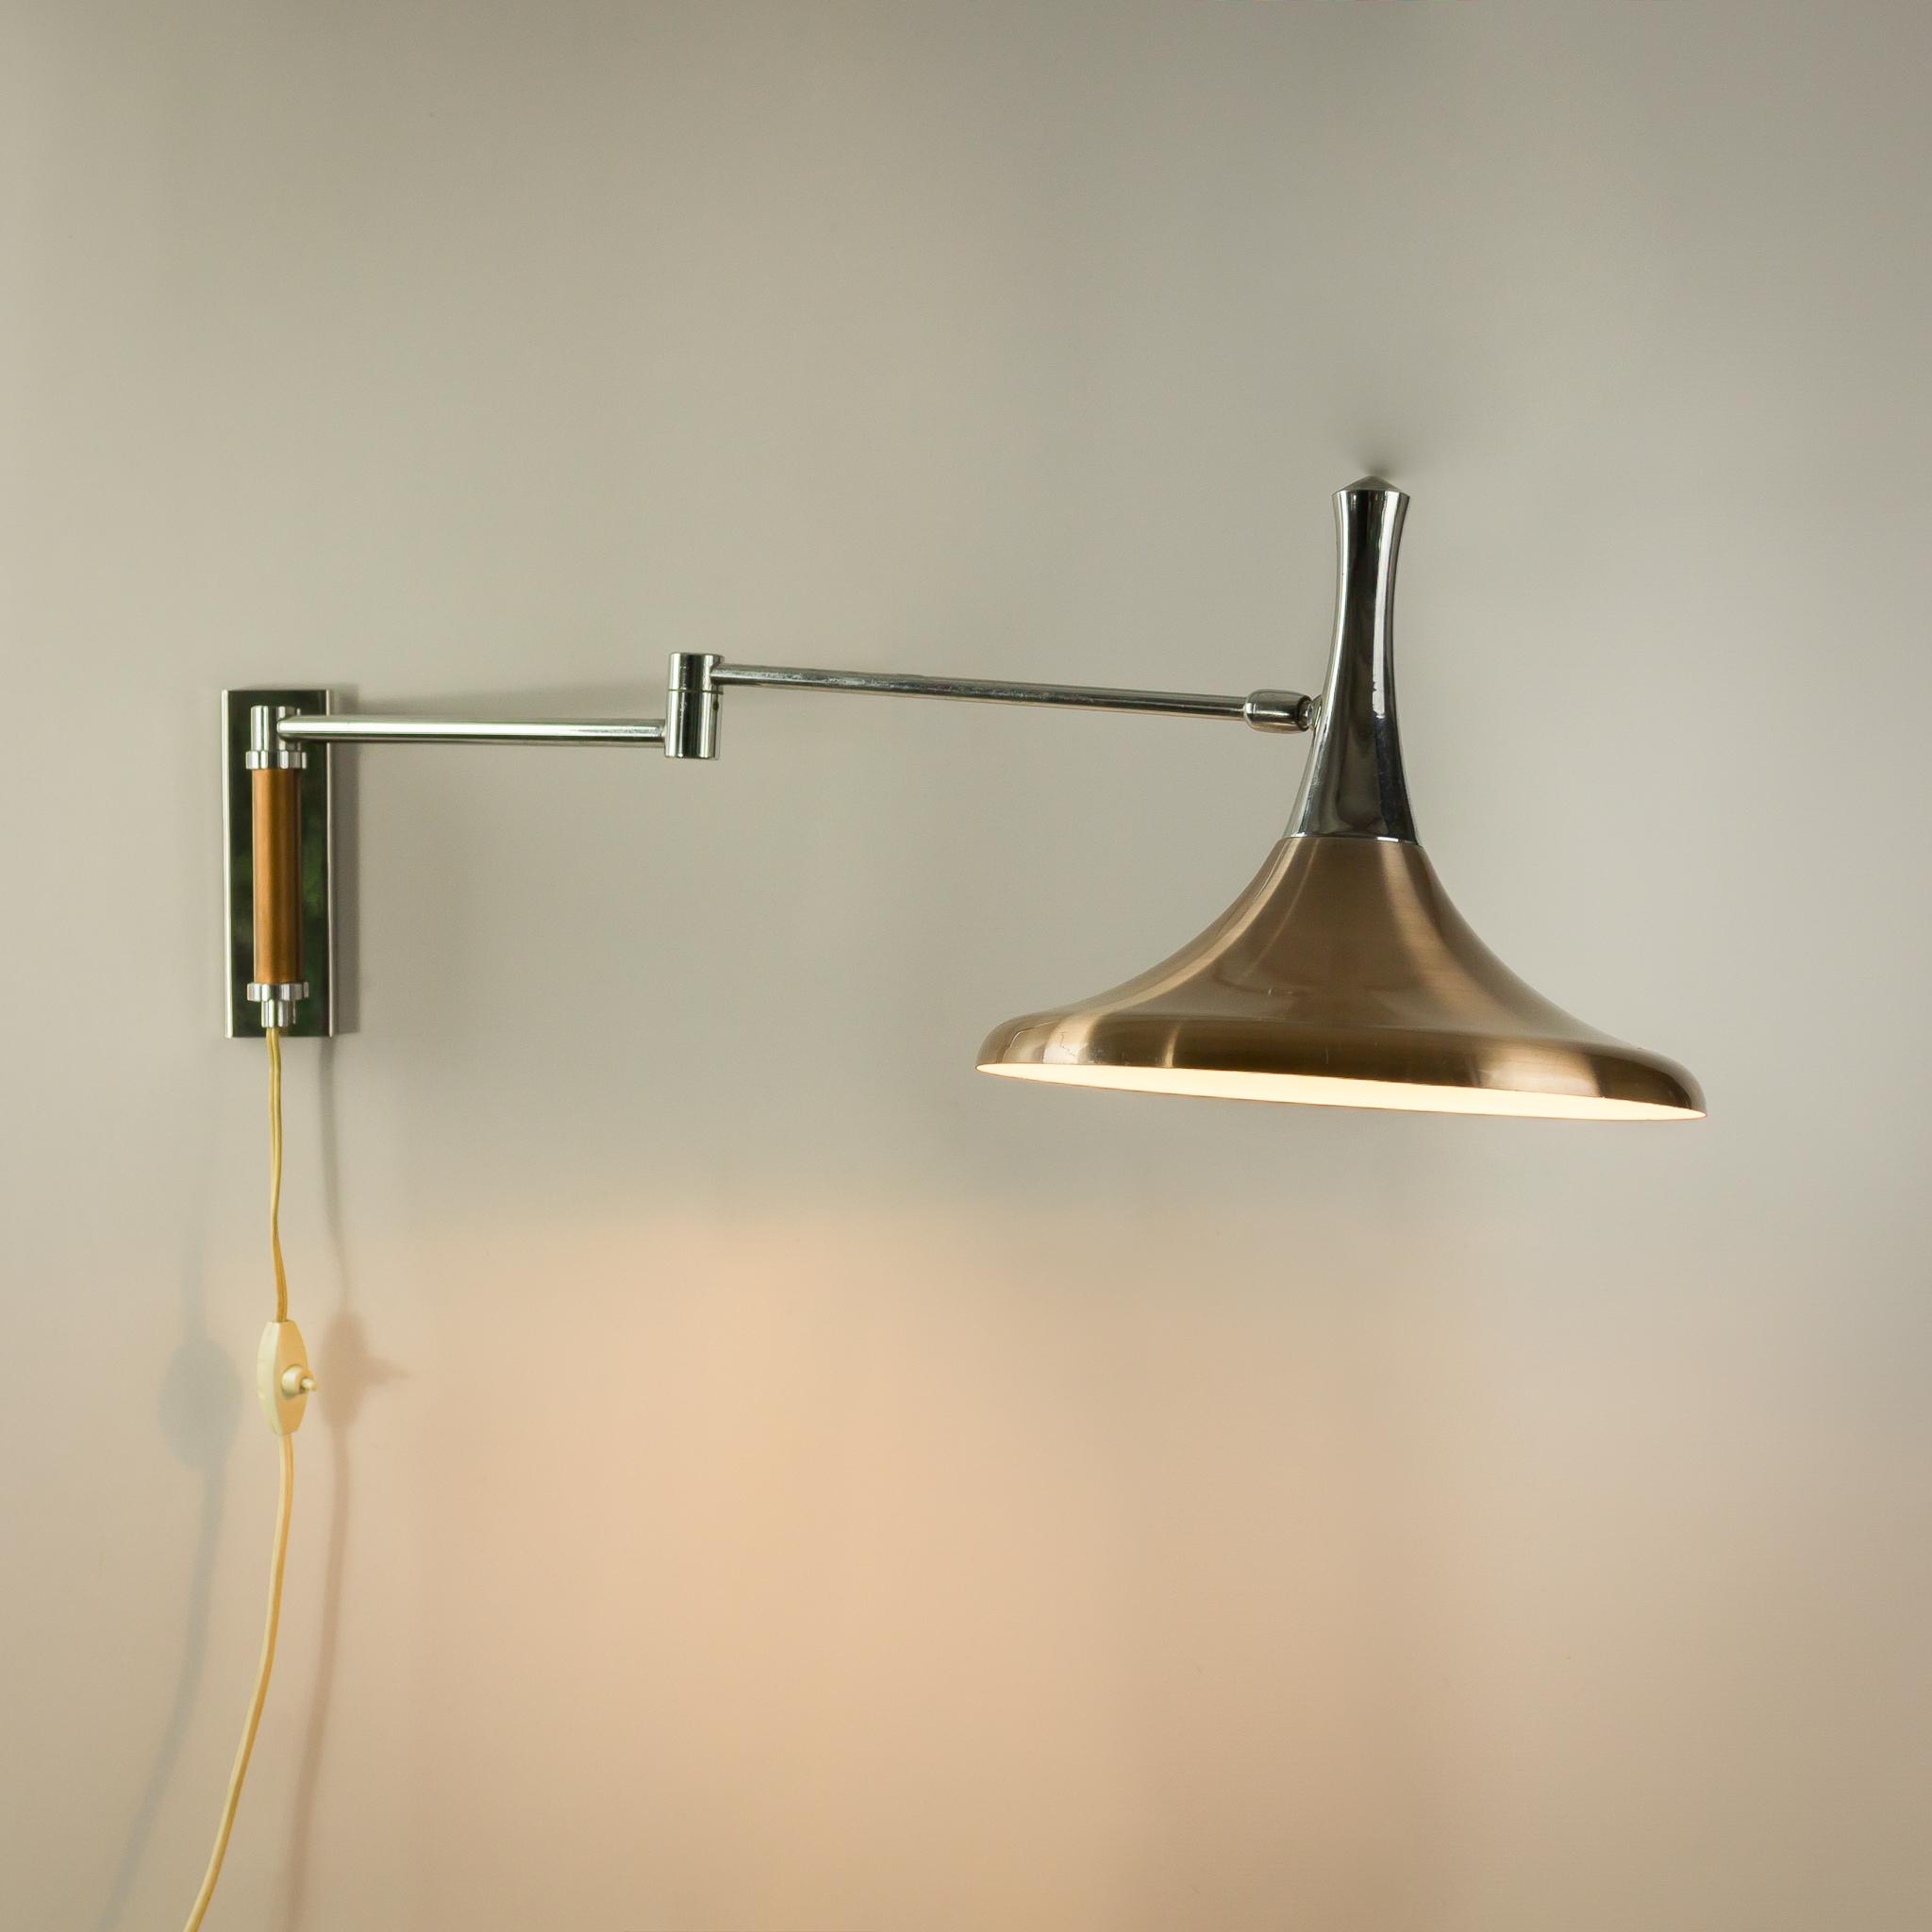 magic wand swing arm wall lamp domicile swing arm wall lamp